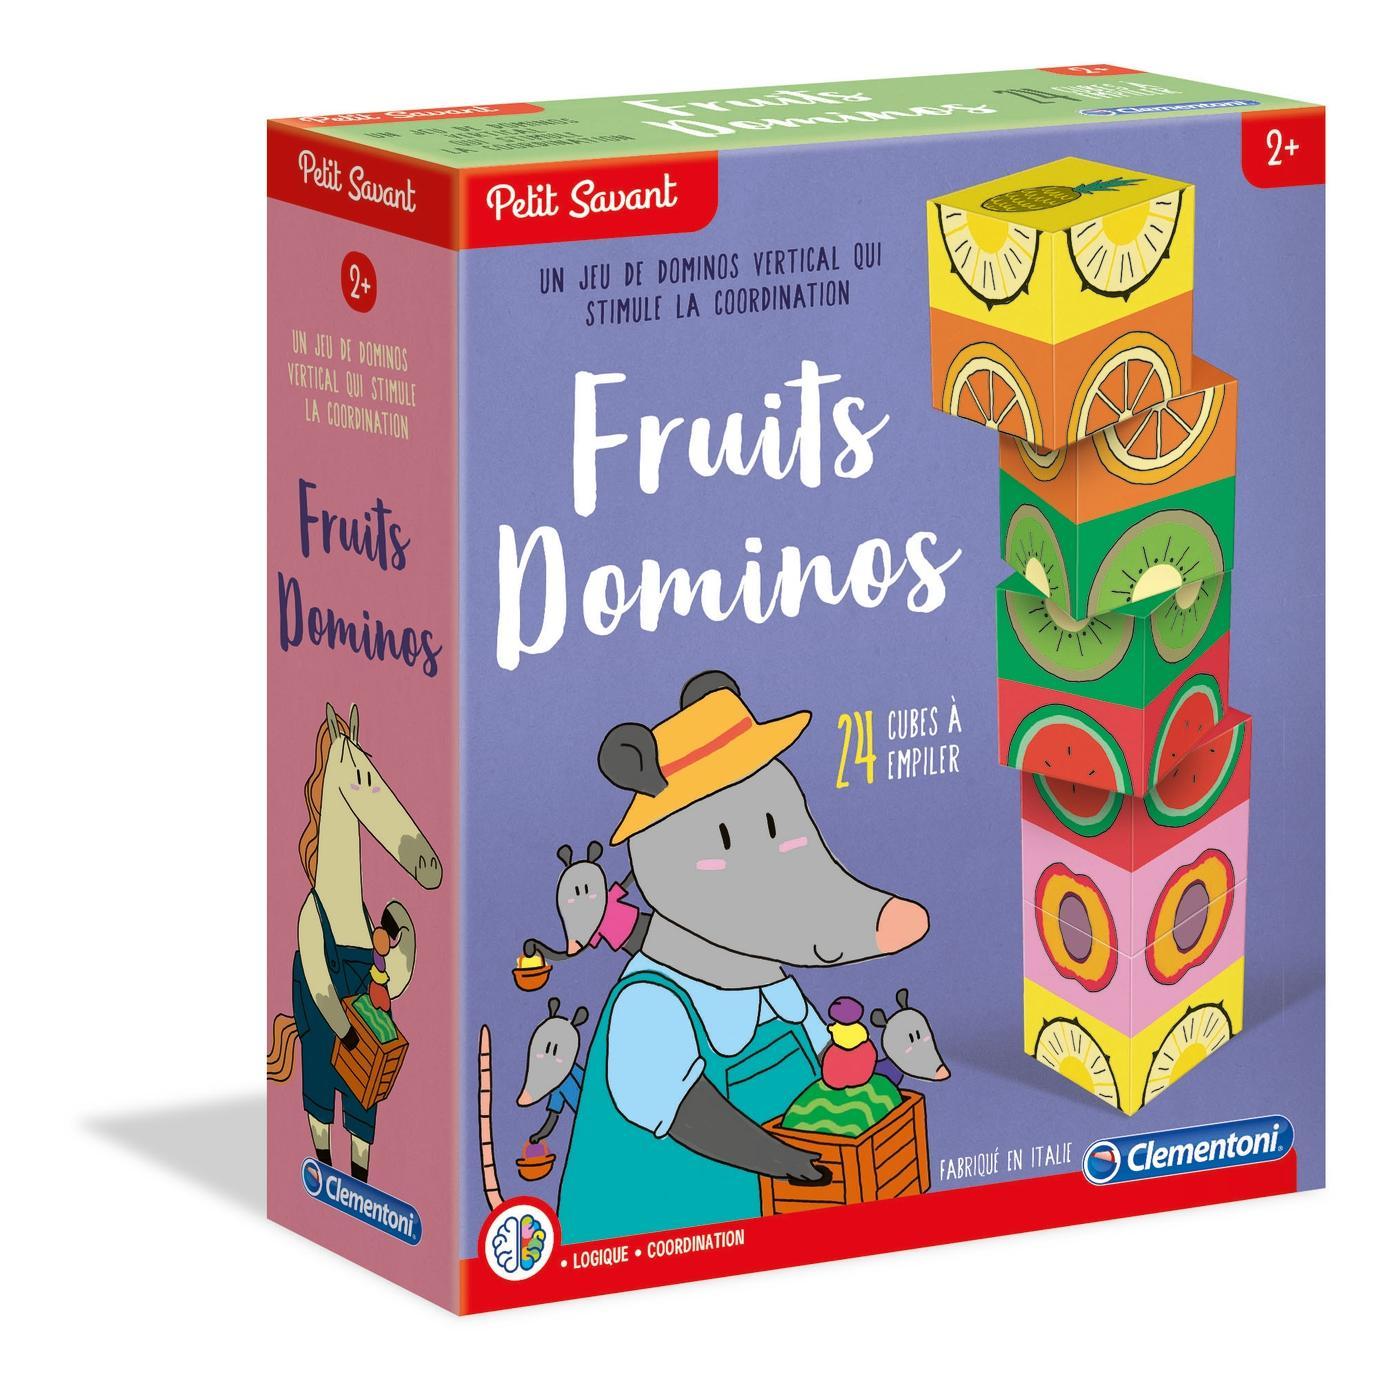 Fruits dominos